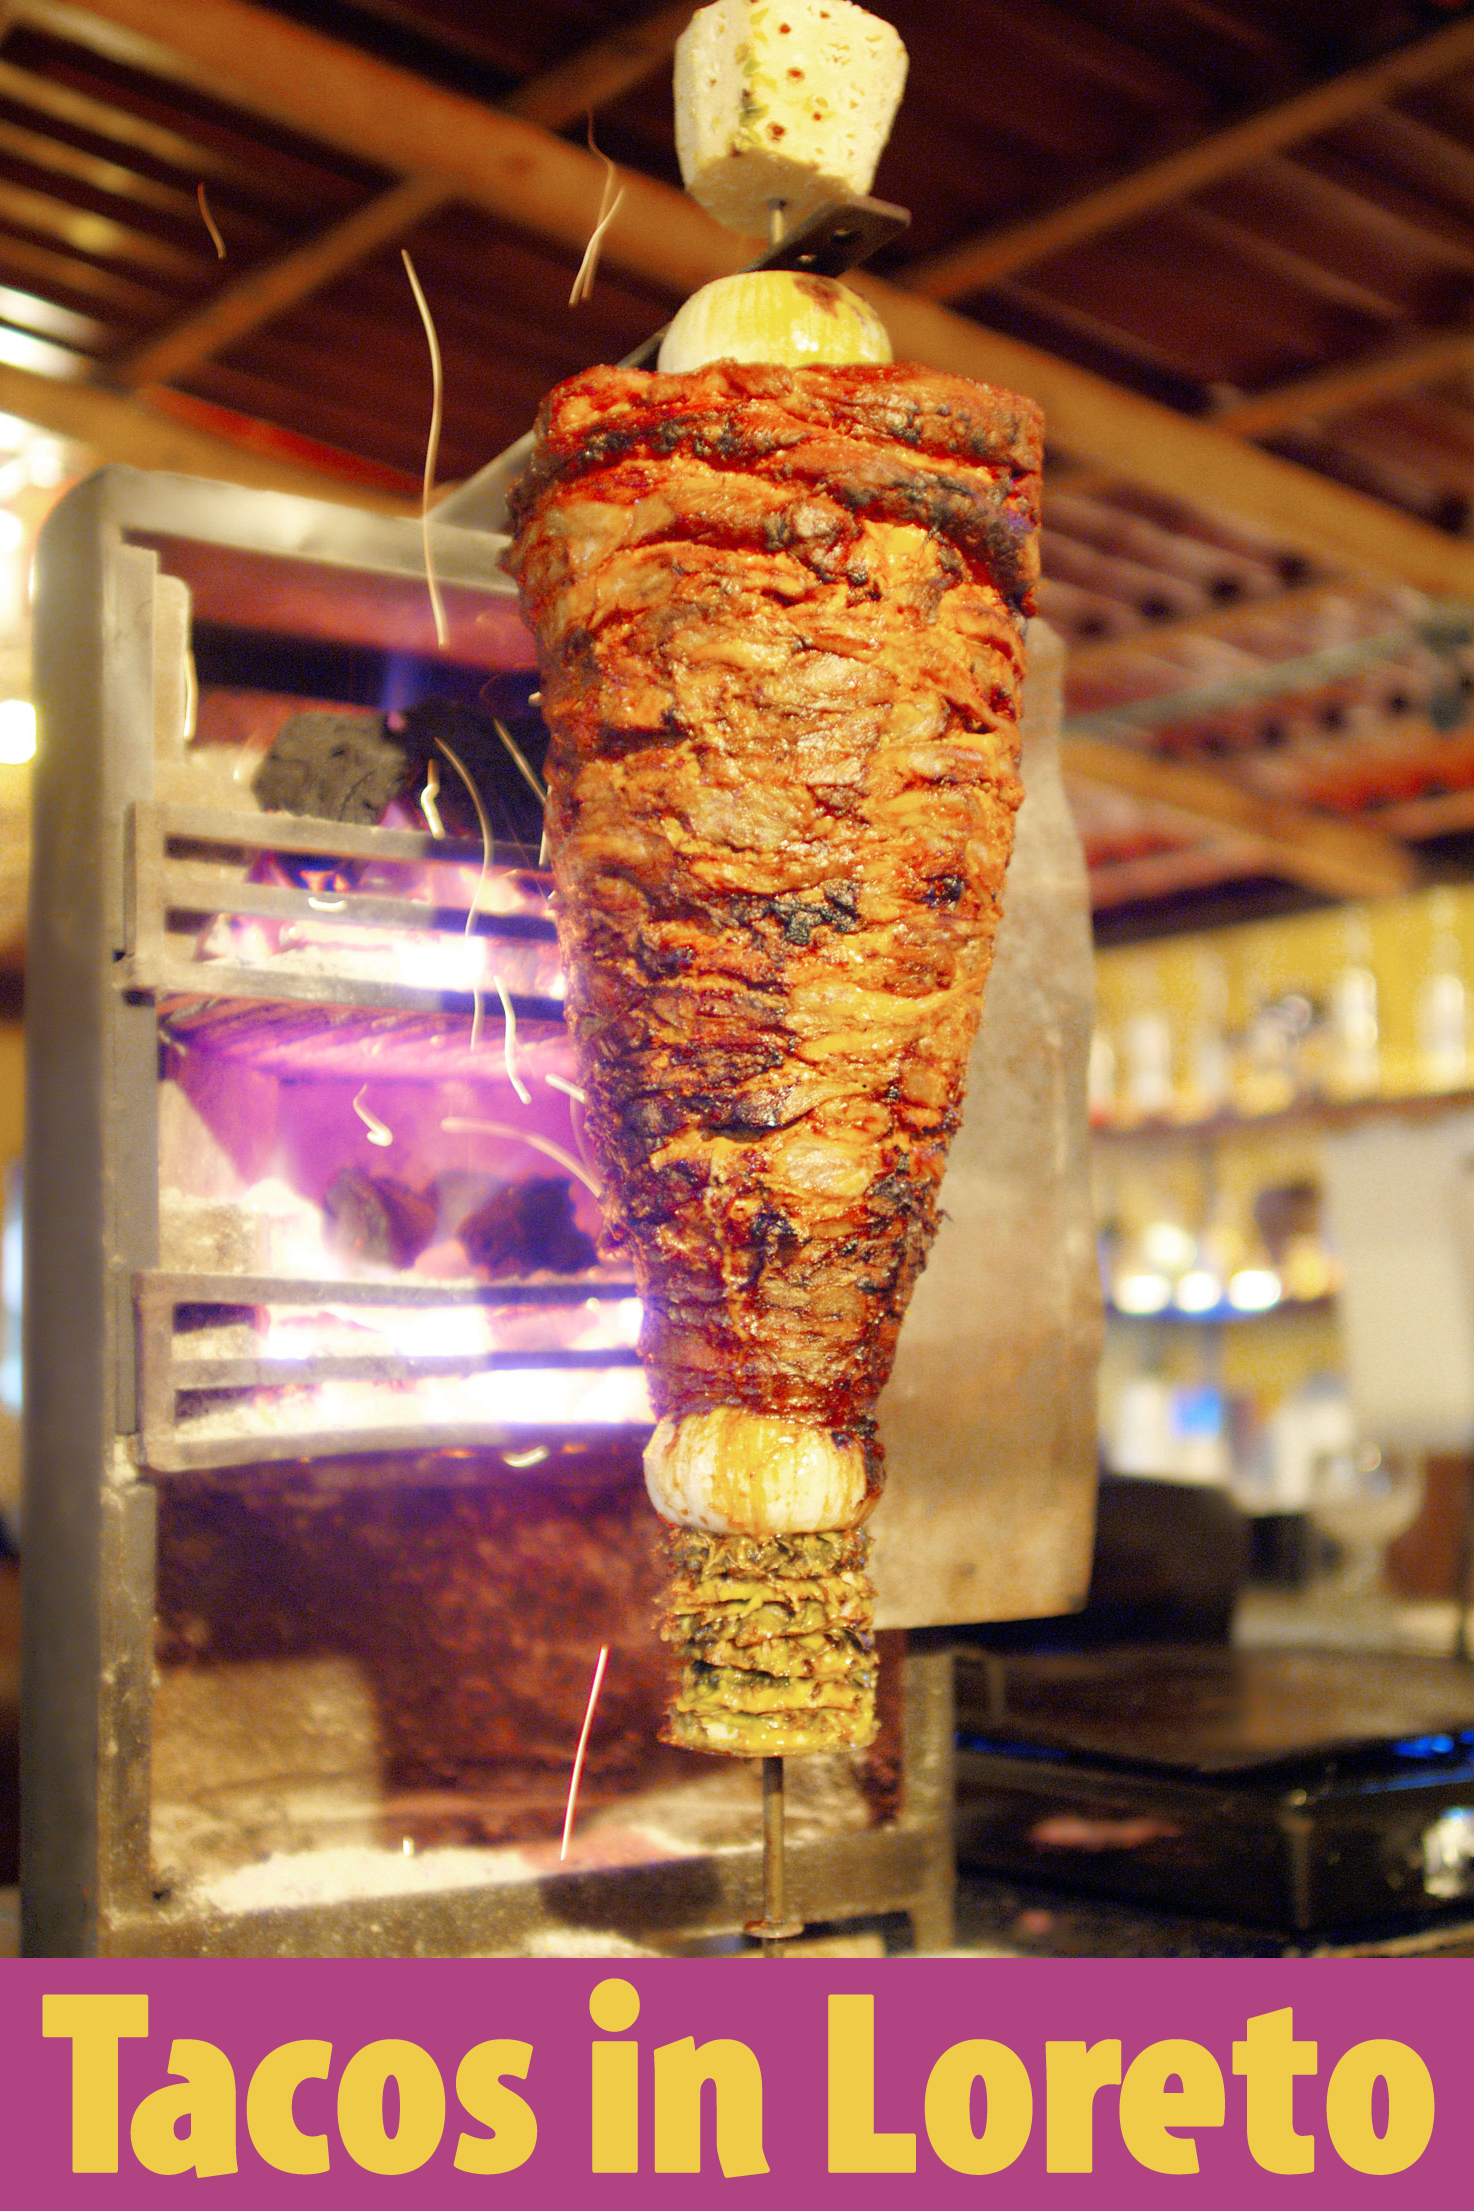 Tacos in Loreto